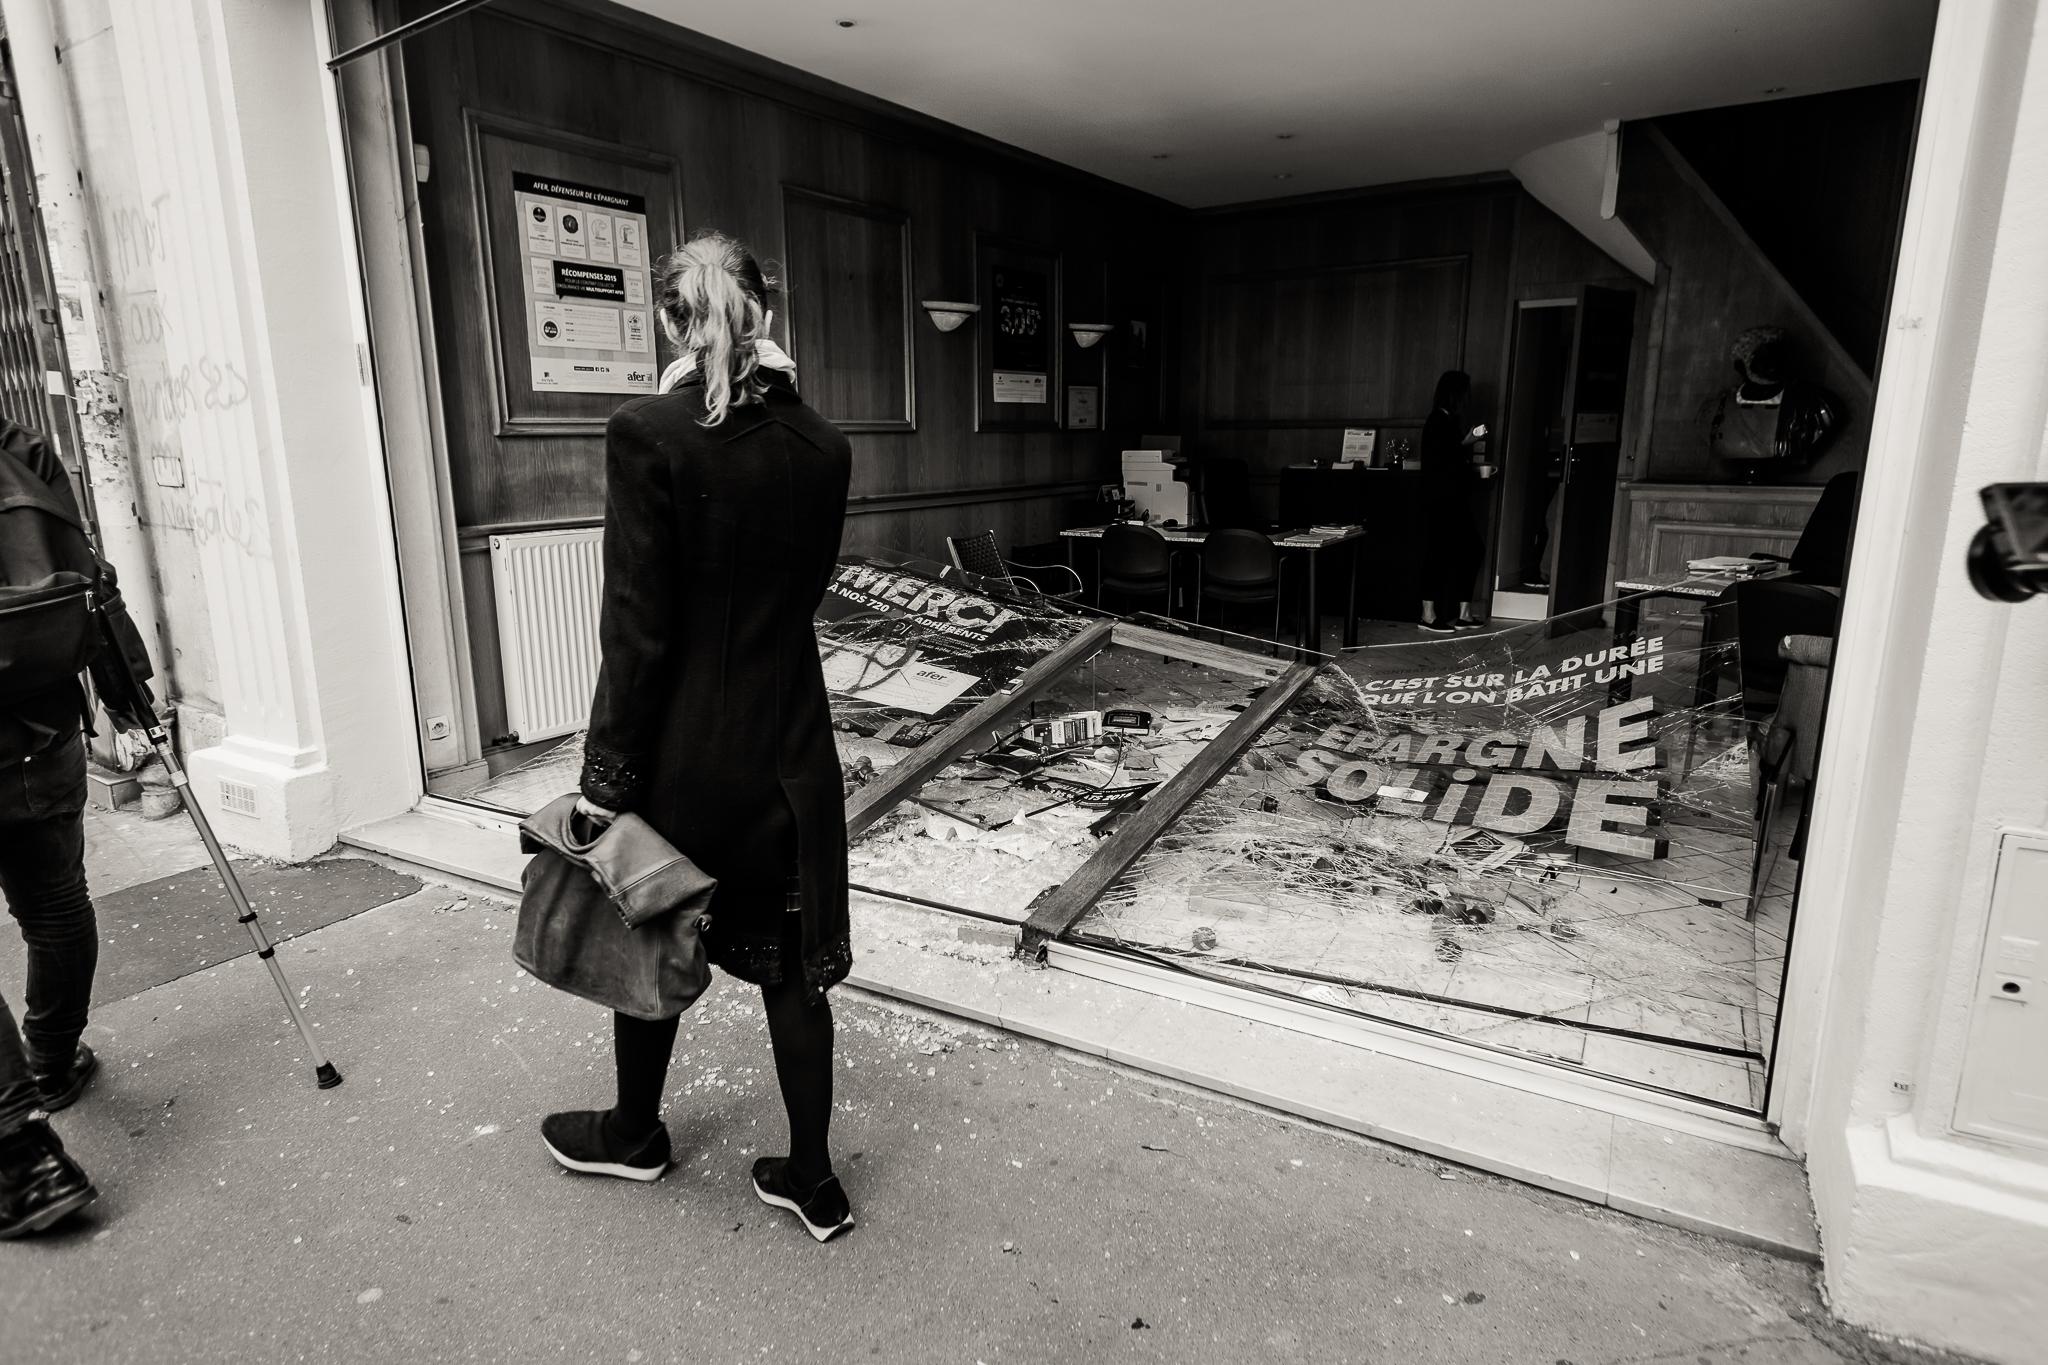 MO_Paris_Manif-56